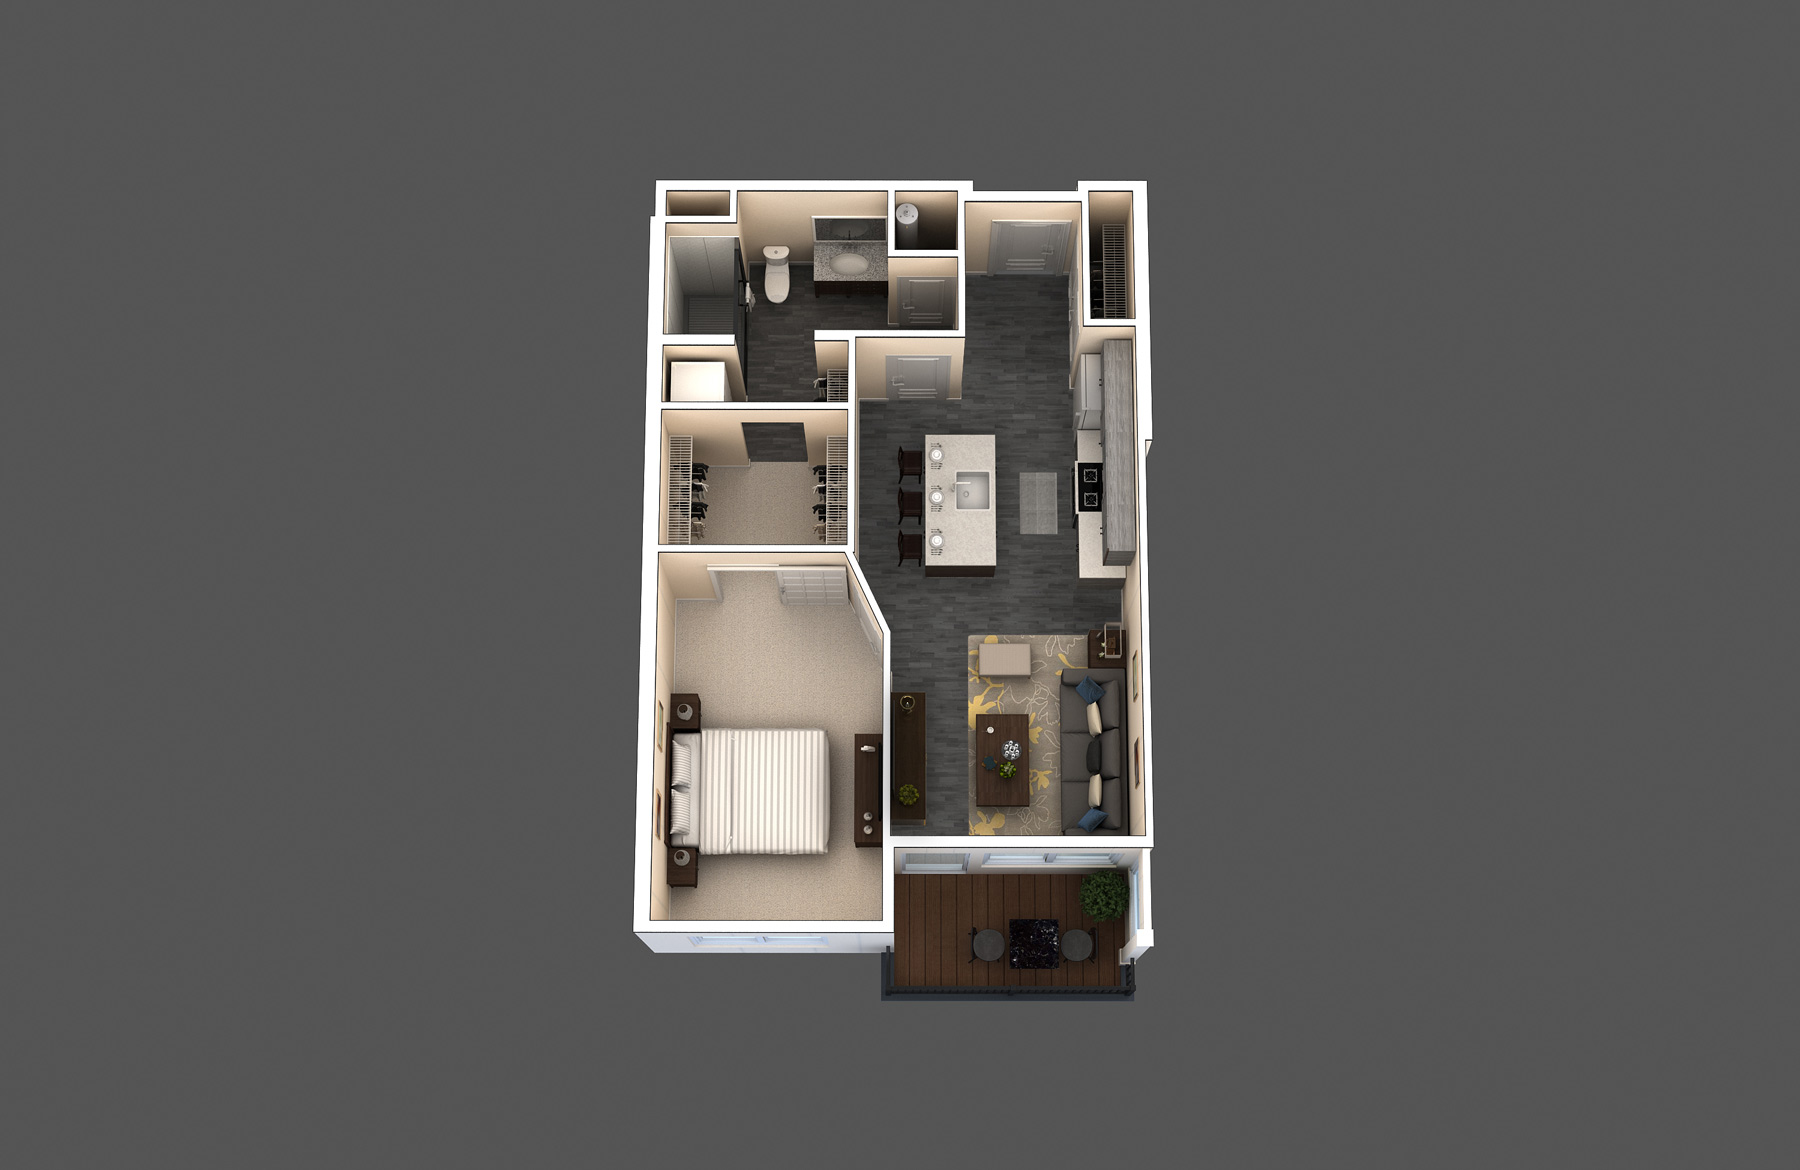 The Cantina floor plan